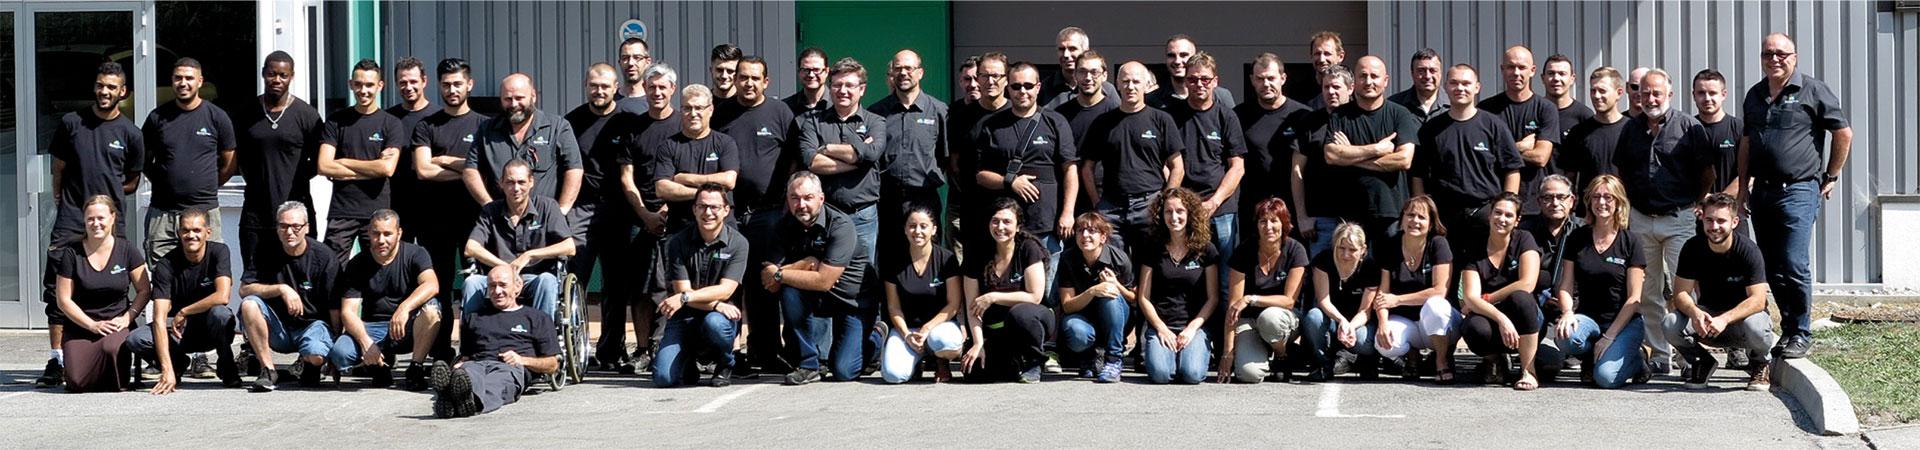 Groupe HBP Equipe